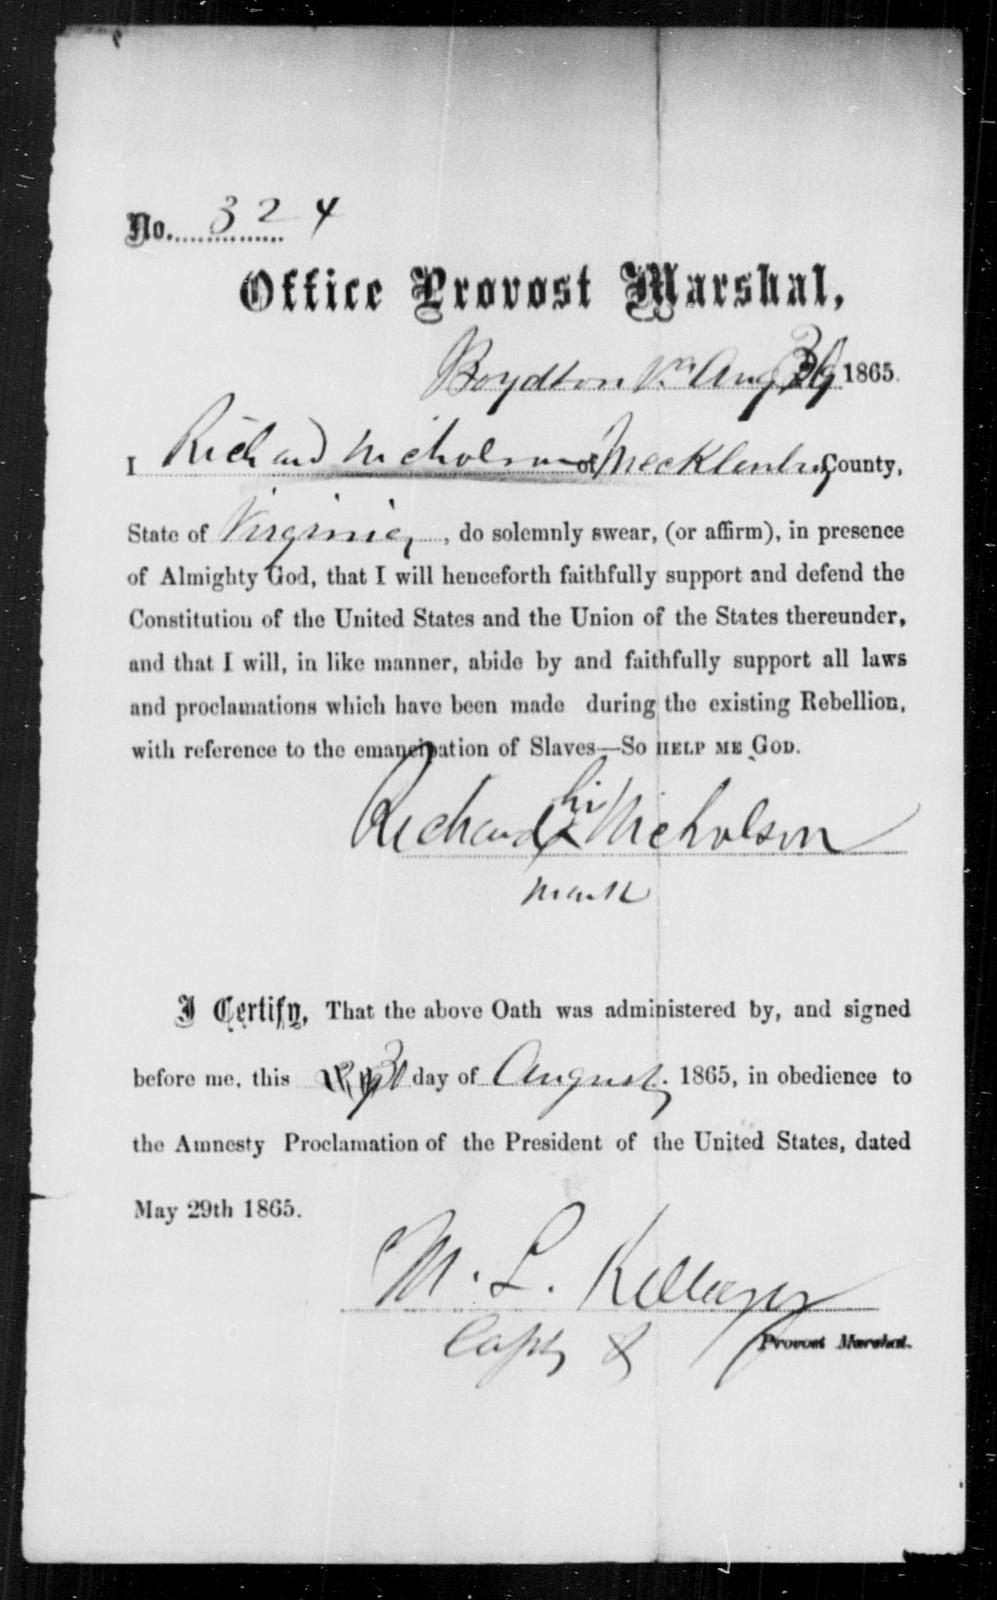 Nicholson, Richard - State: Virginia - Year: 1865